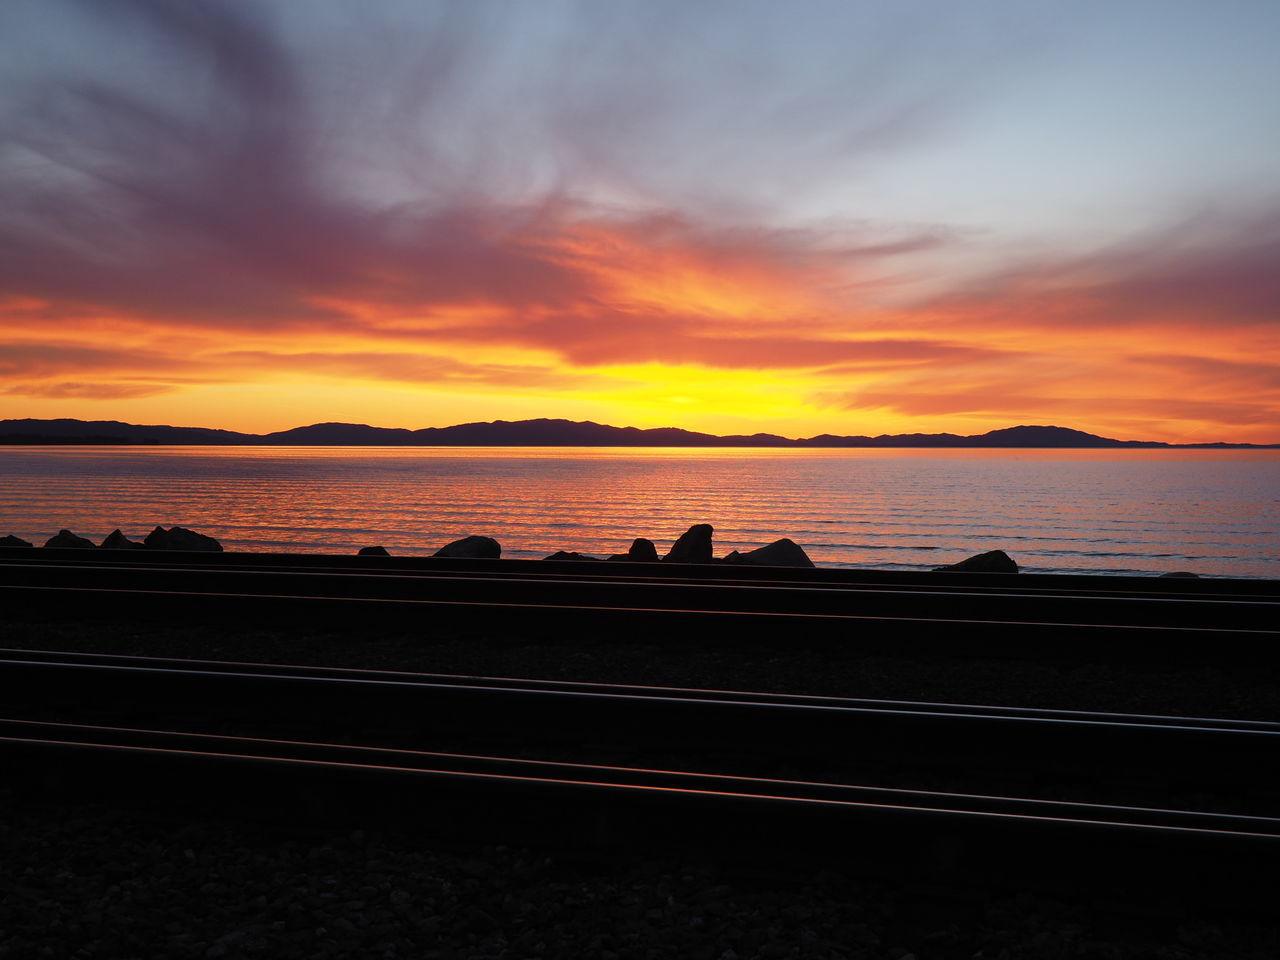 Sunset Sunset_collection Sunset Silhouettes Sunsetbythesea🌅 Twilight Sky Train Tracks Railway Amtrak Landscape Landscape_Collection Taking Pictures Idyllic Scenery 43 Golden Moments